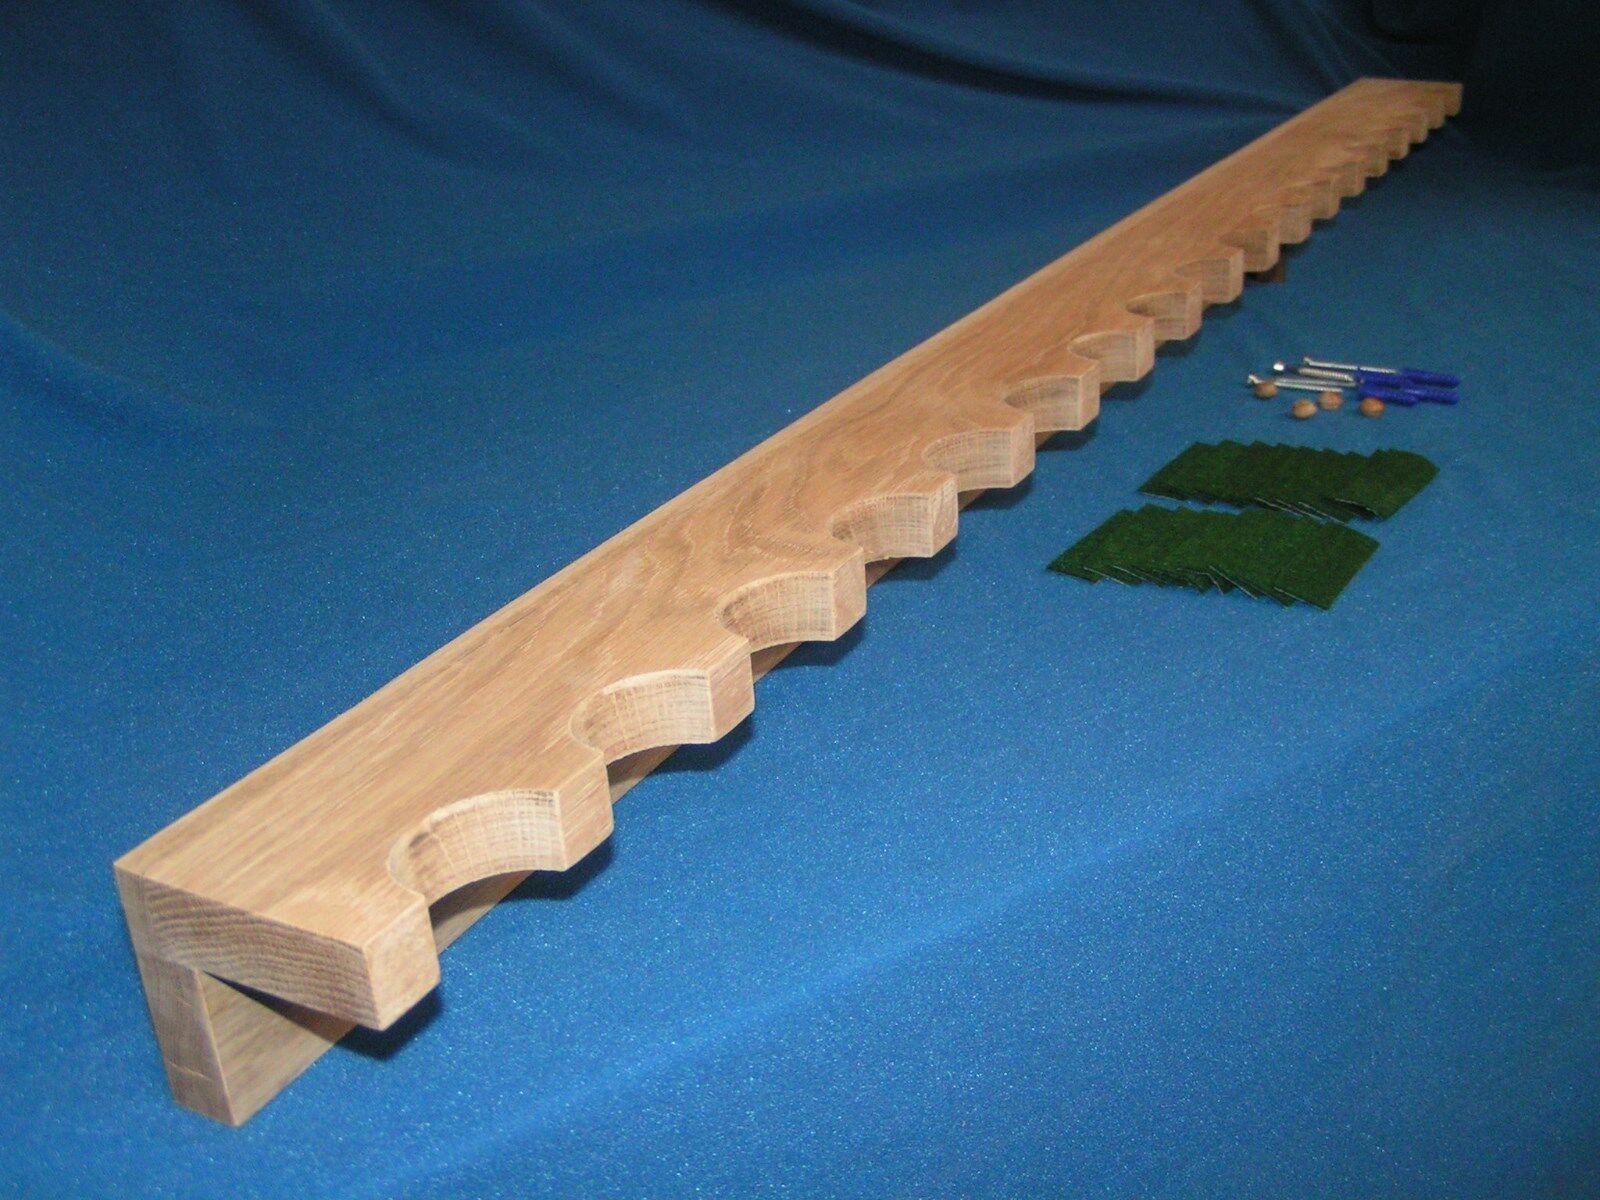 20 pistola Pistola de Armario Rack-Construcción De Roble Sólido